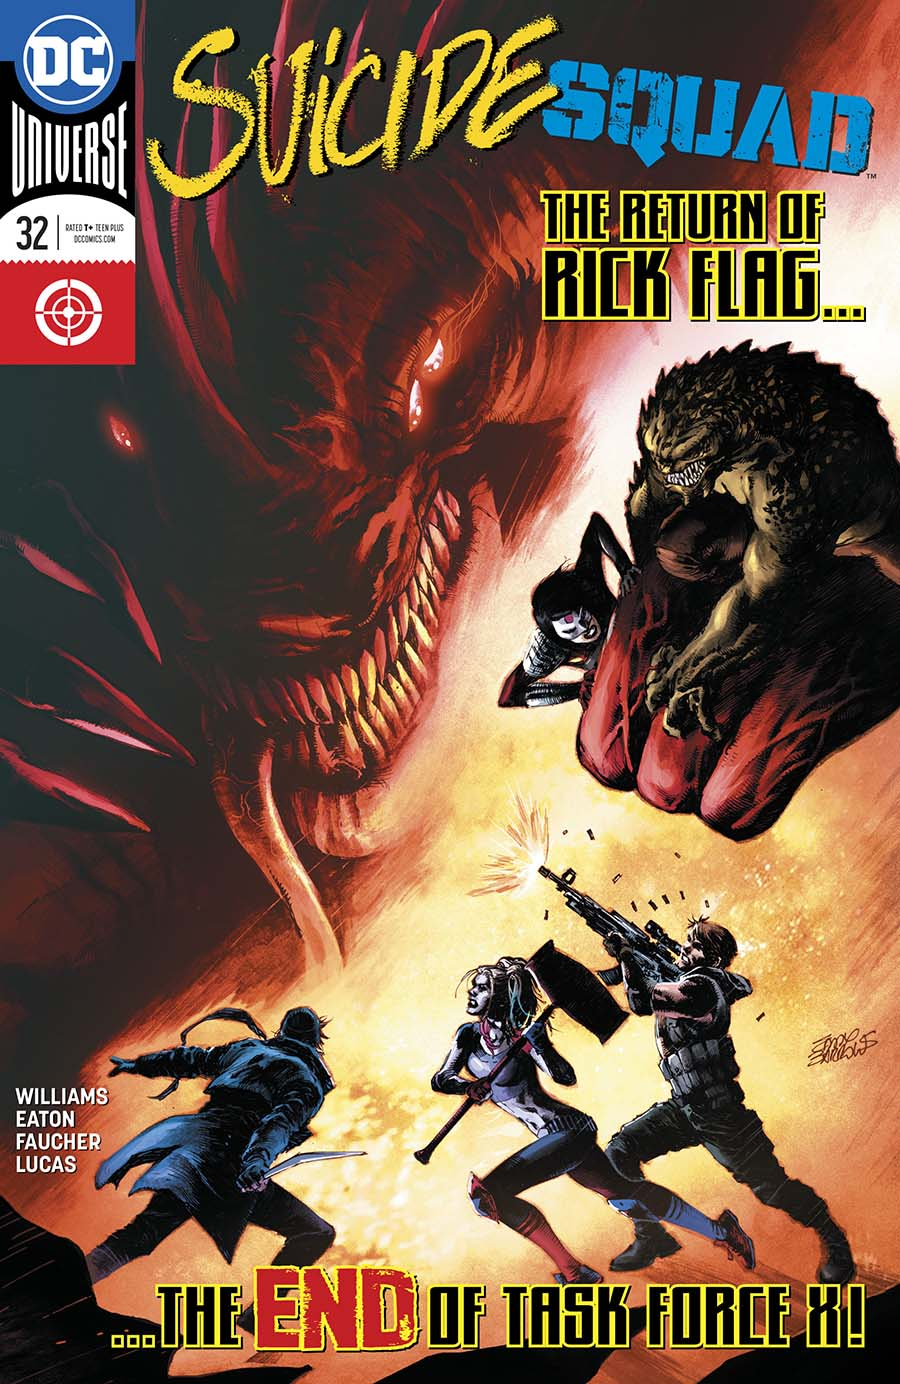 Suicide Squad Vol 4 #32 Cover A Regular Eddy Barrows Cover